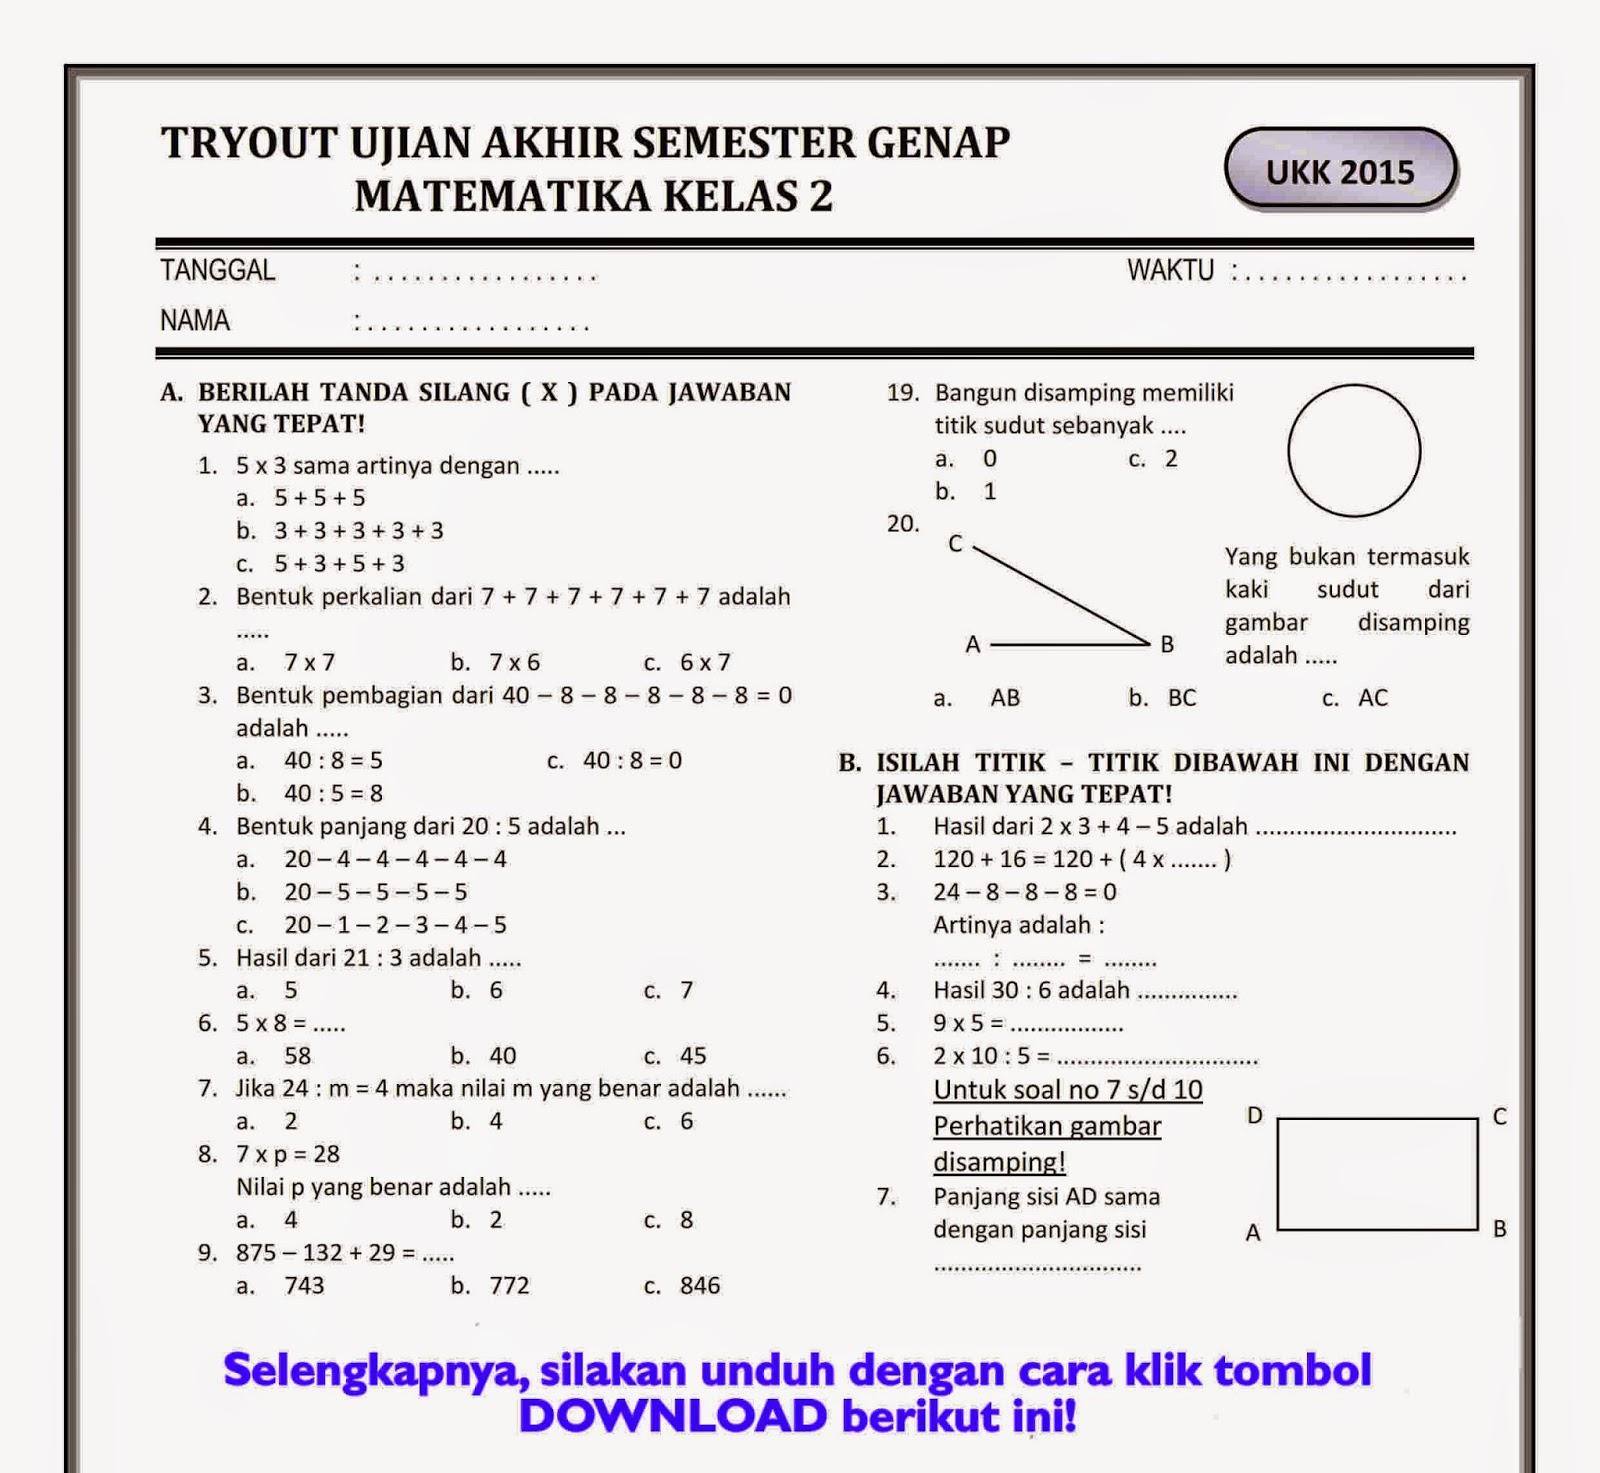 Download Soal Ukk Matematika Kelas 2 Semester Genap Rief Awa Blog Download Kumpulan Soal